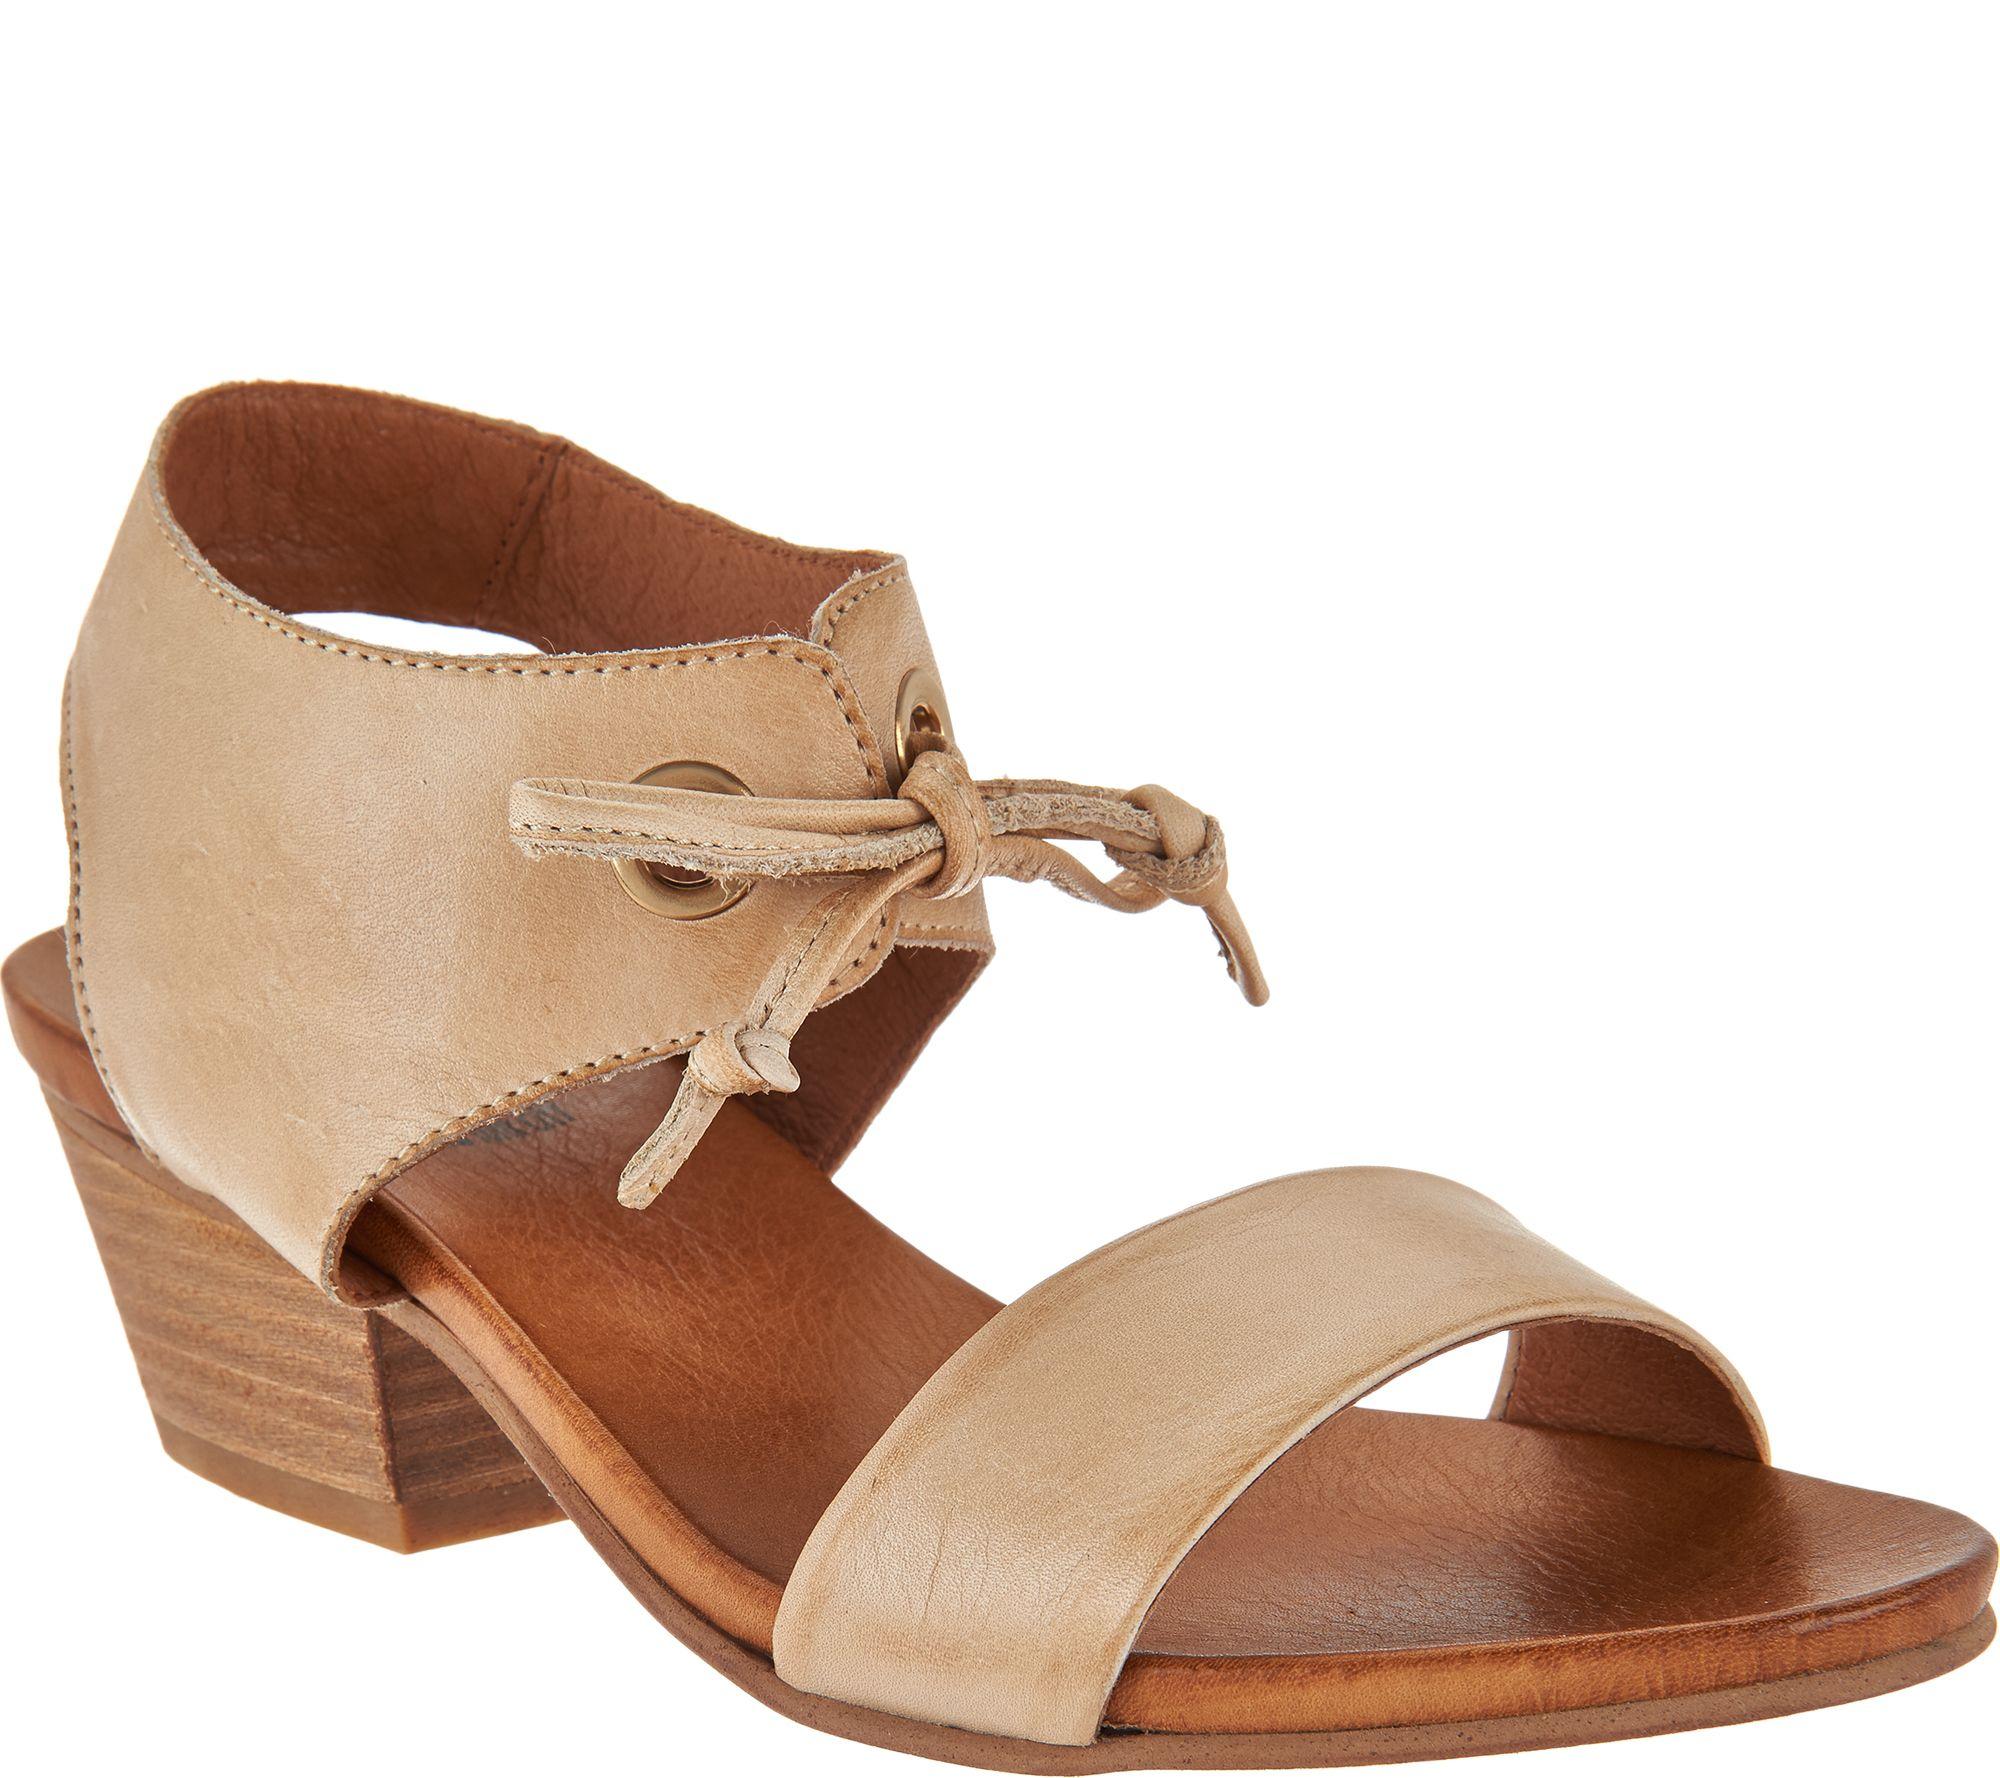 best wholesale Miz Mooz Leather Sandals with Tie Detail - Vanessa sale find great hot sale online fashionable cheap online visit new 1c5Gk